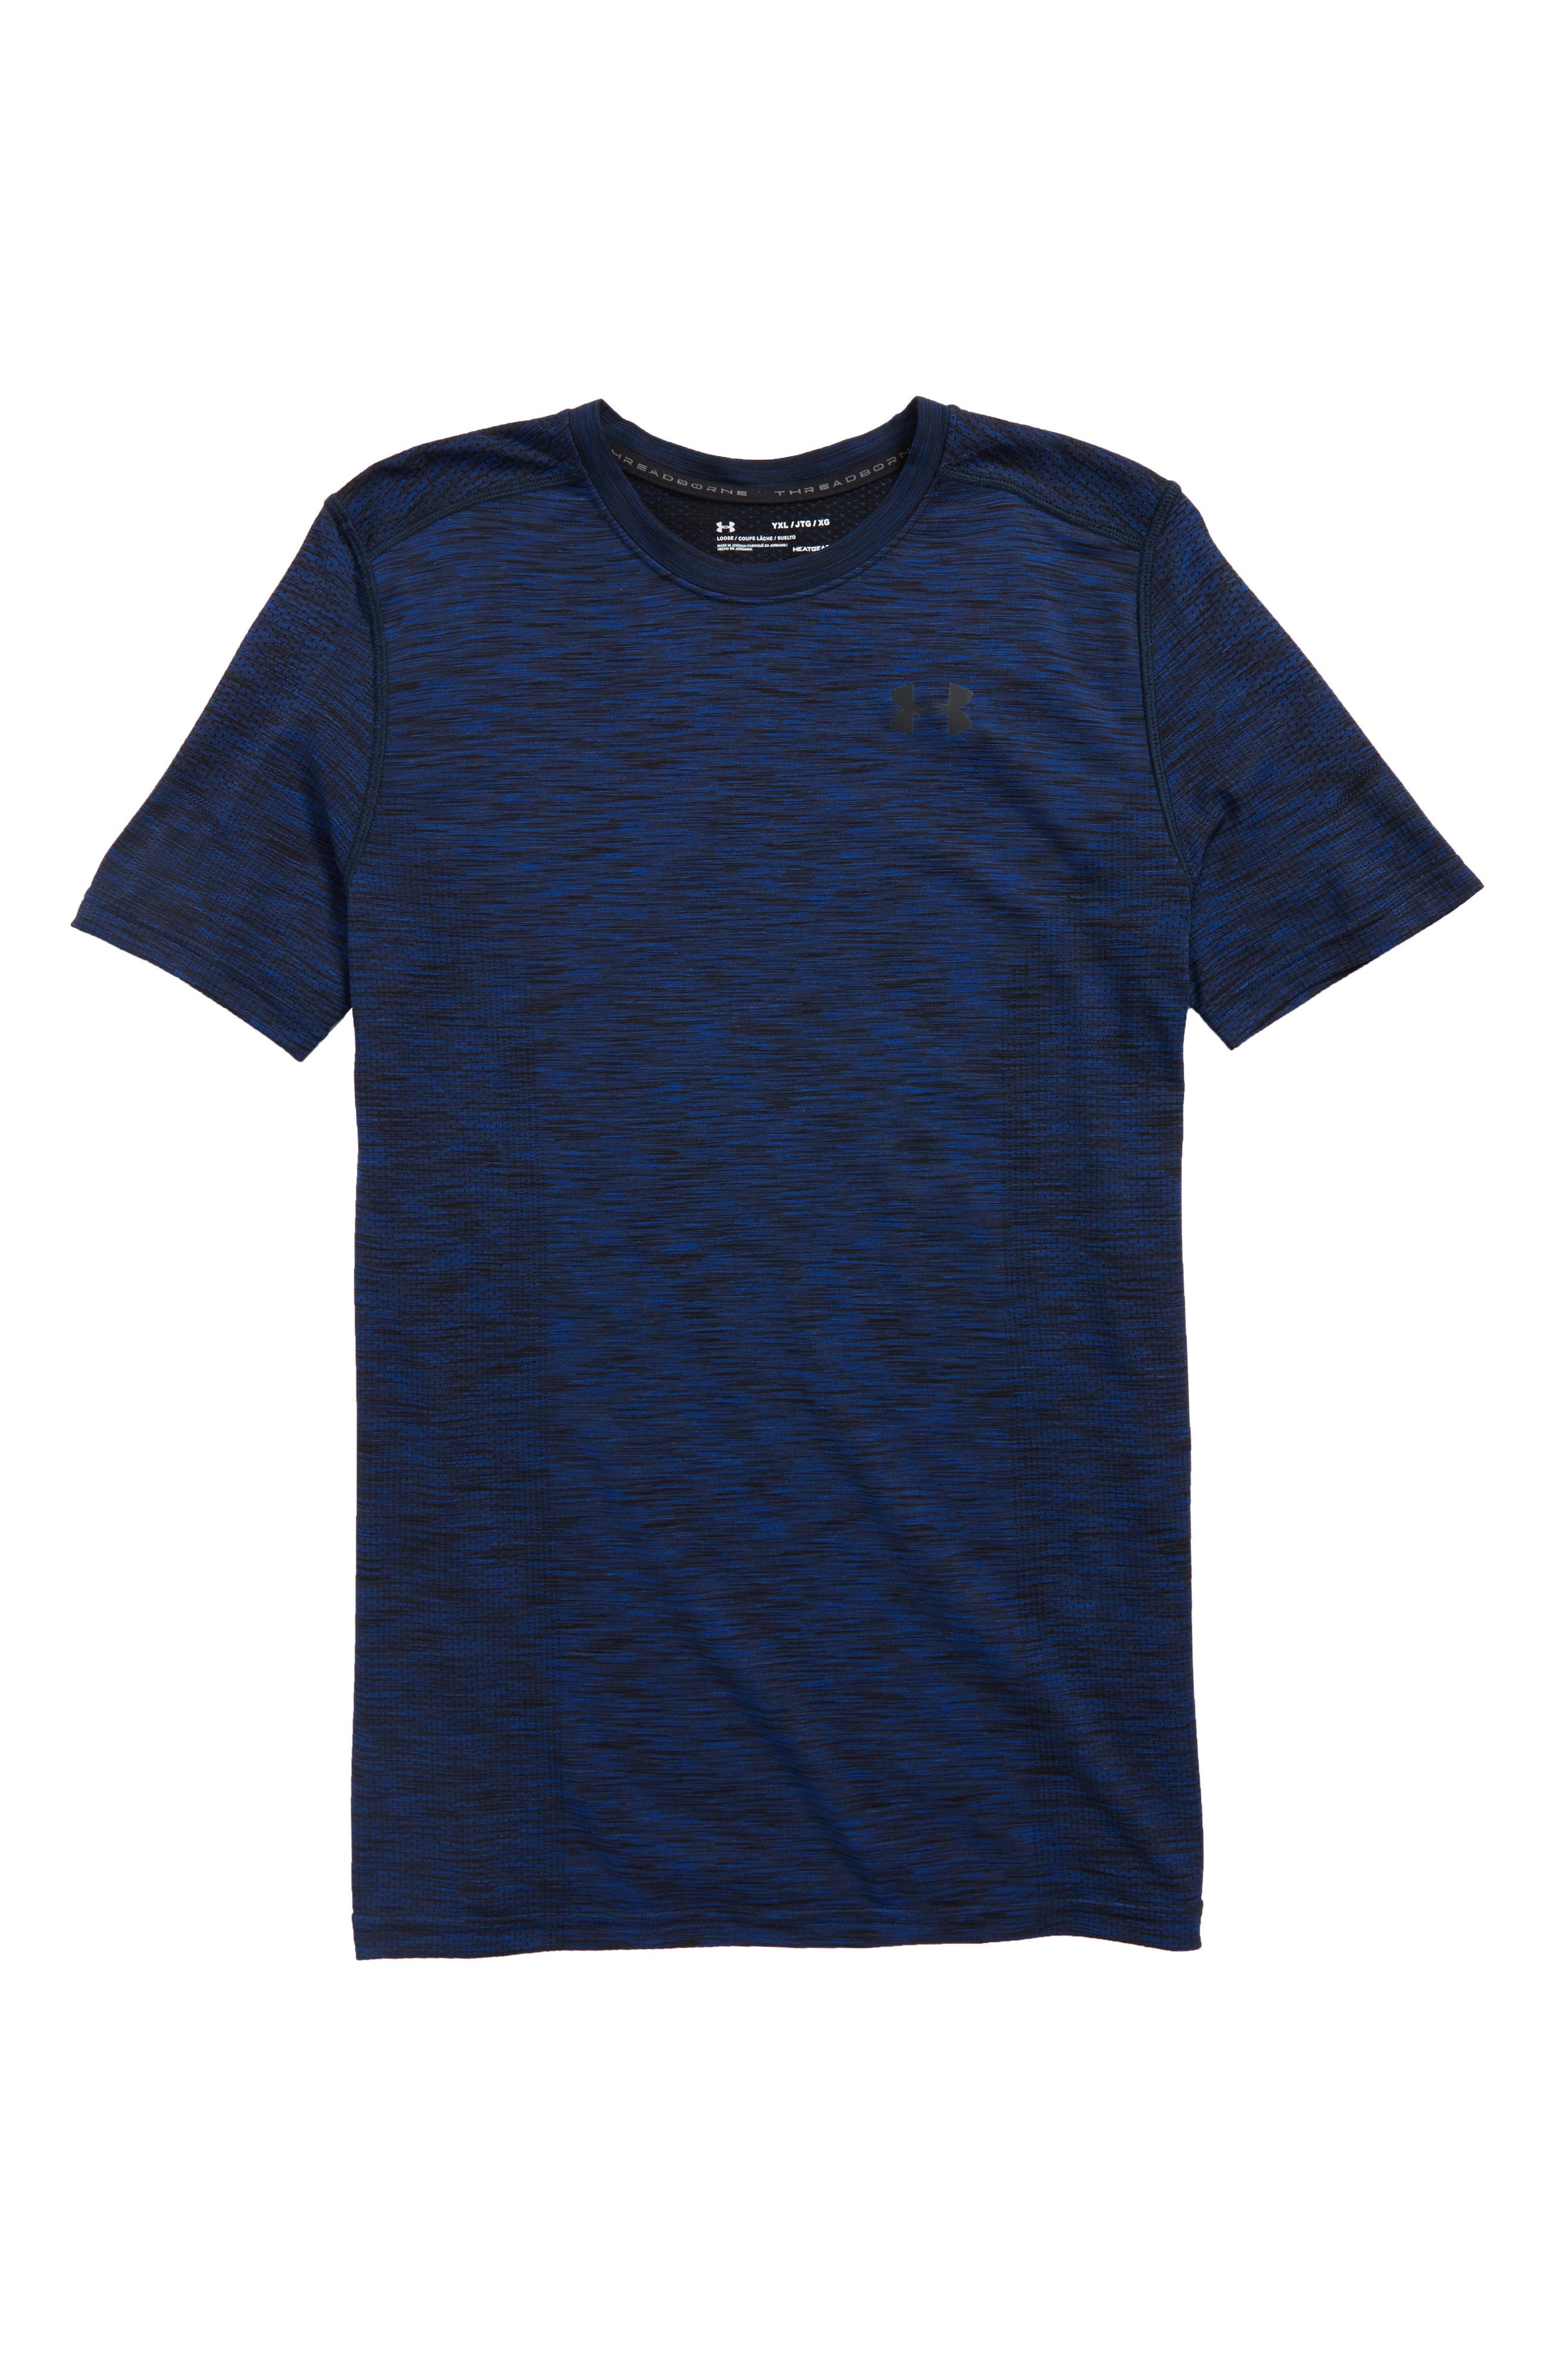 Alternate Image 1 Selected - Under Armour Threadborne HeatGear® Shirt (Little Boys & Big Boys)